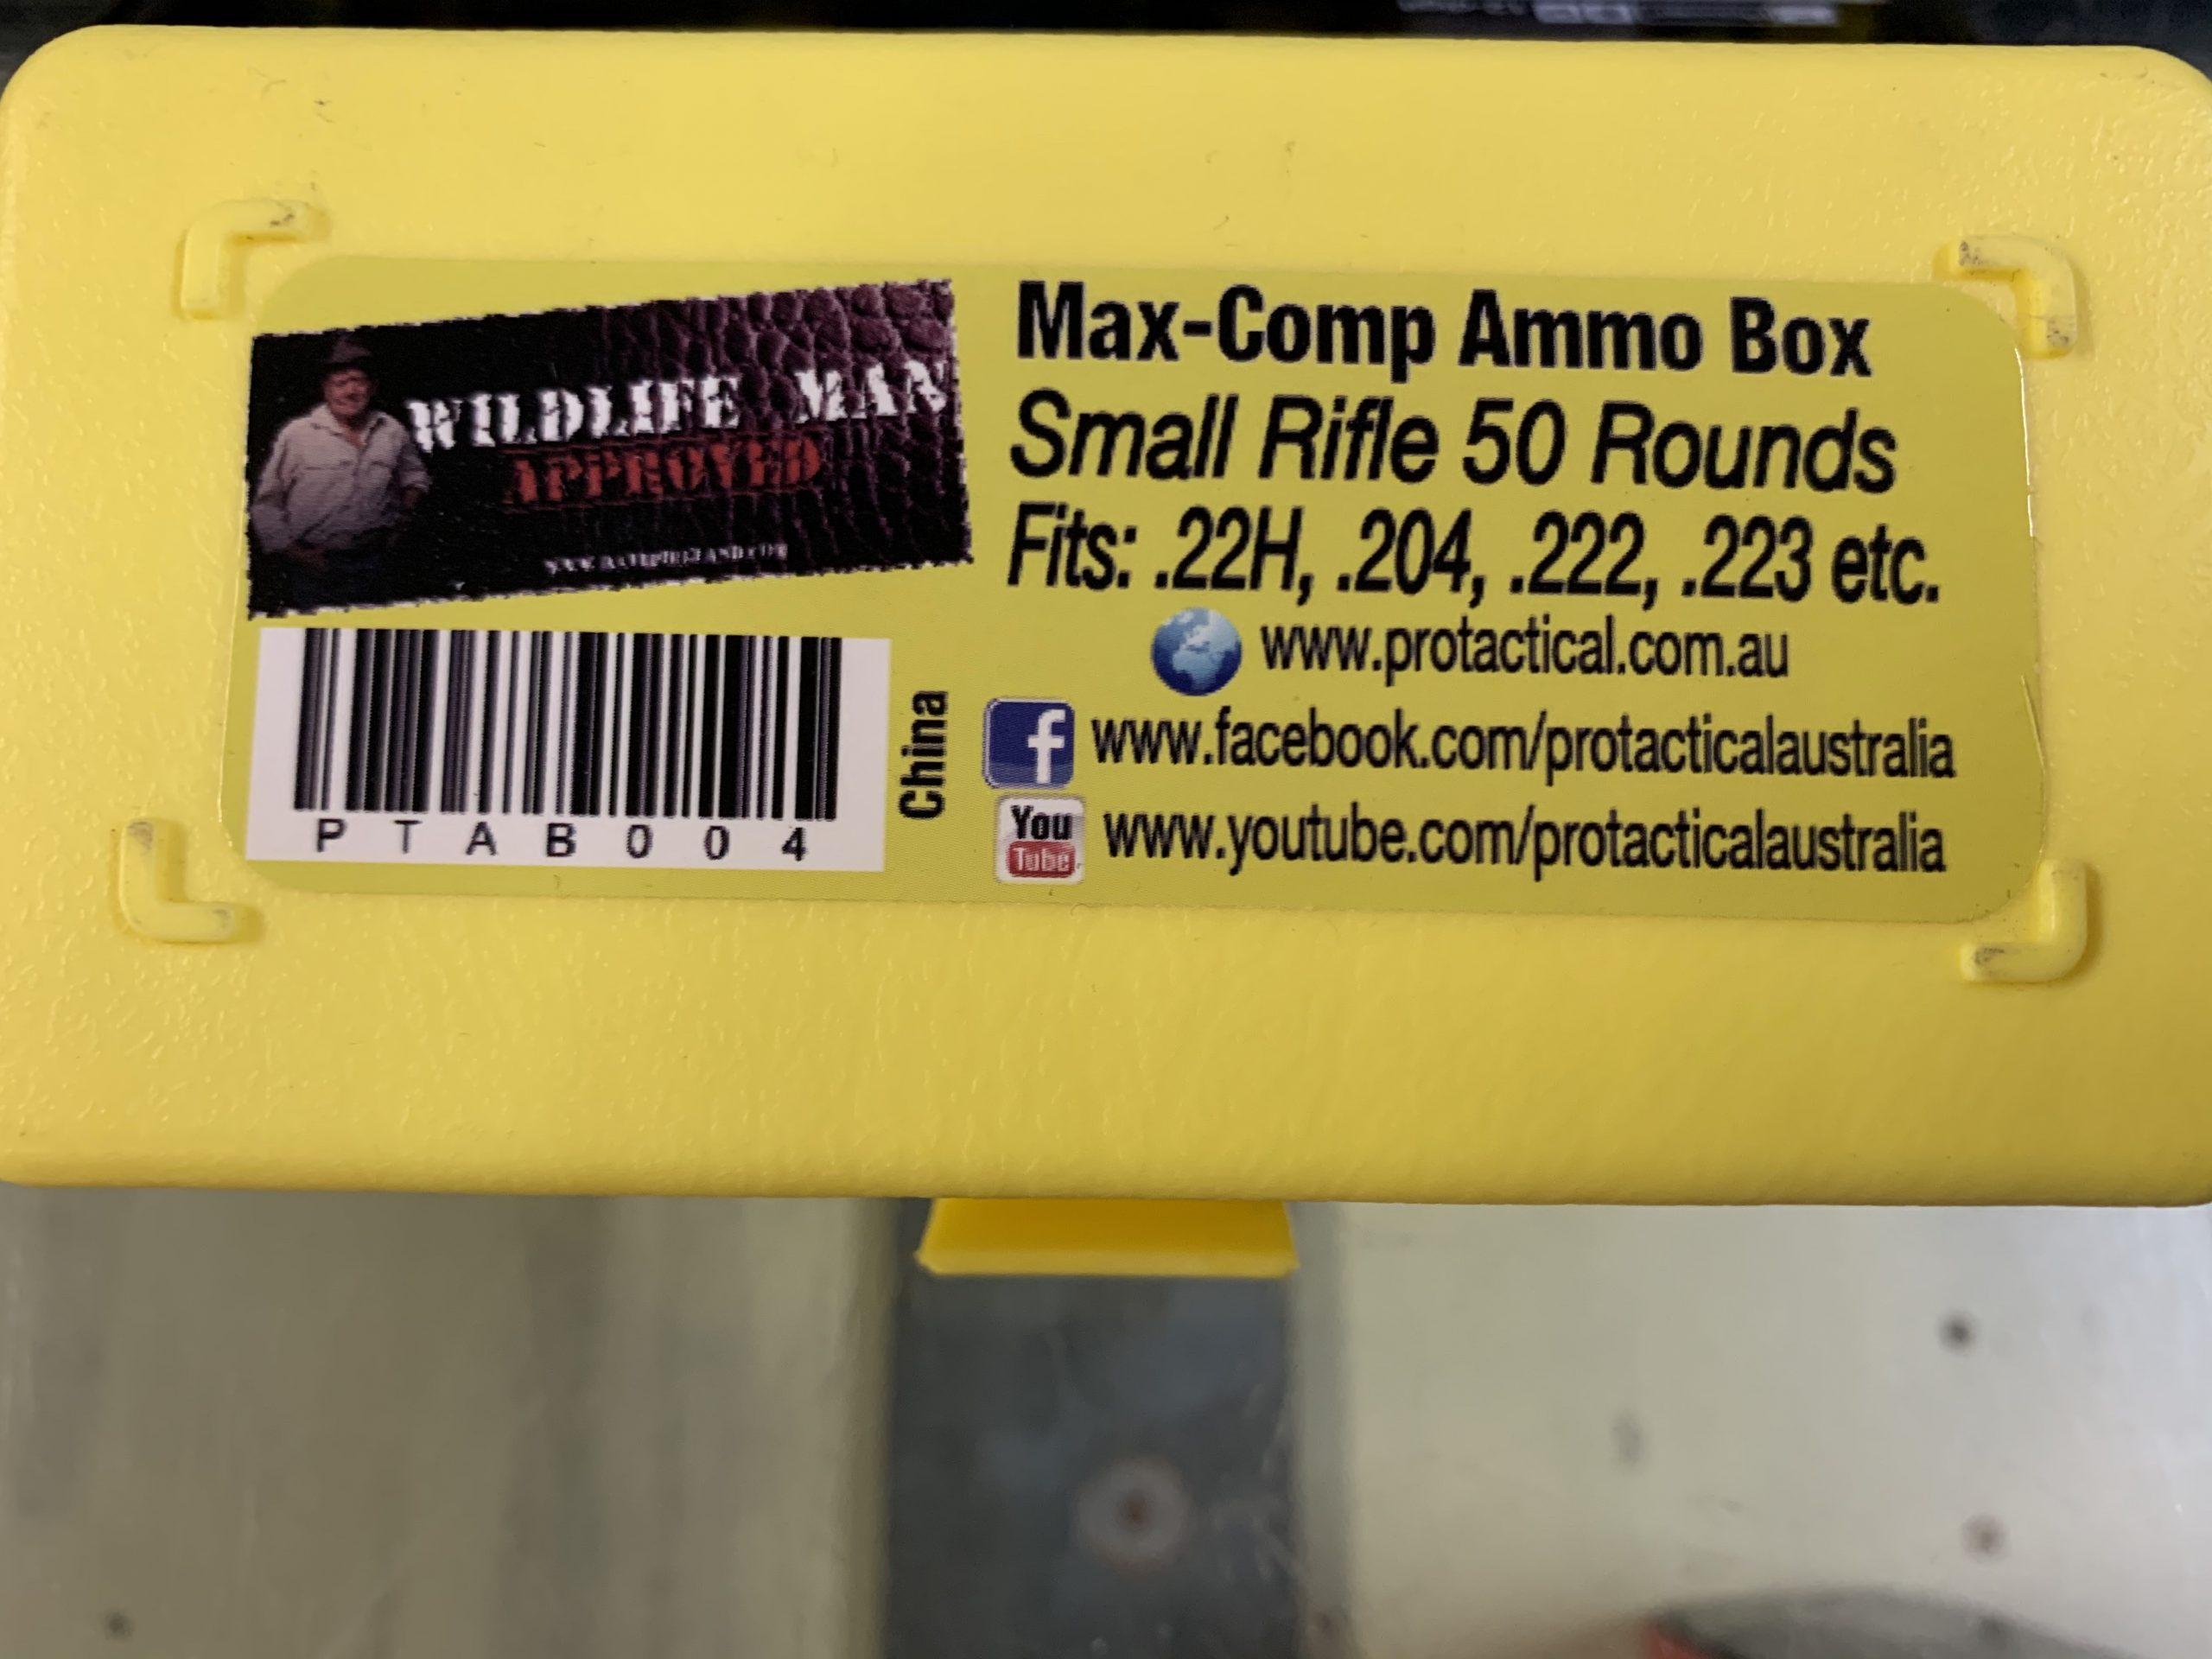 Small Rifle ammo box 222/223 etc (50 capacity) MaxGuard